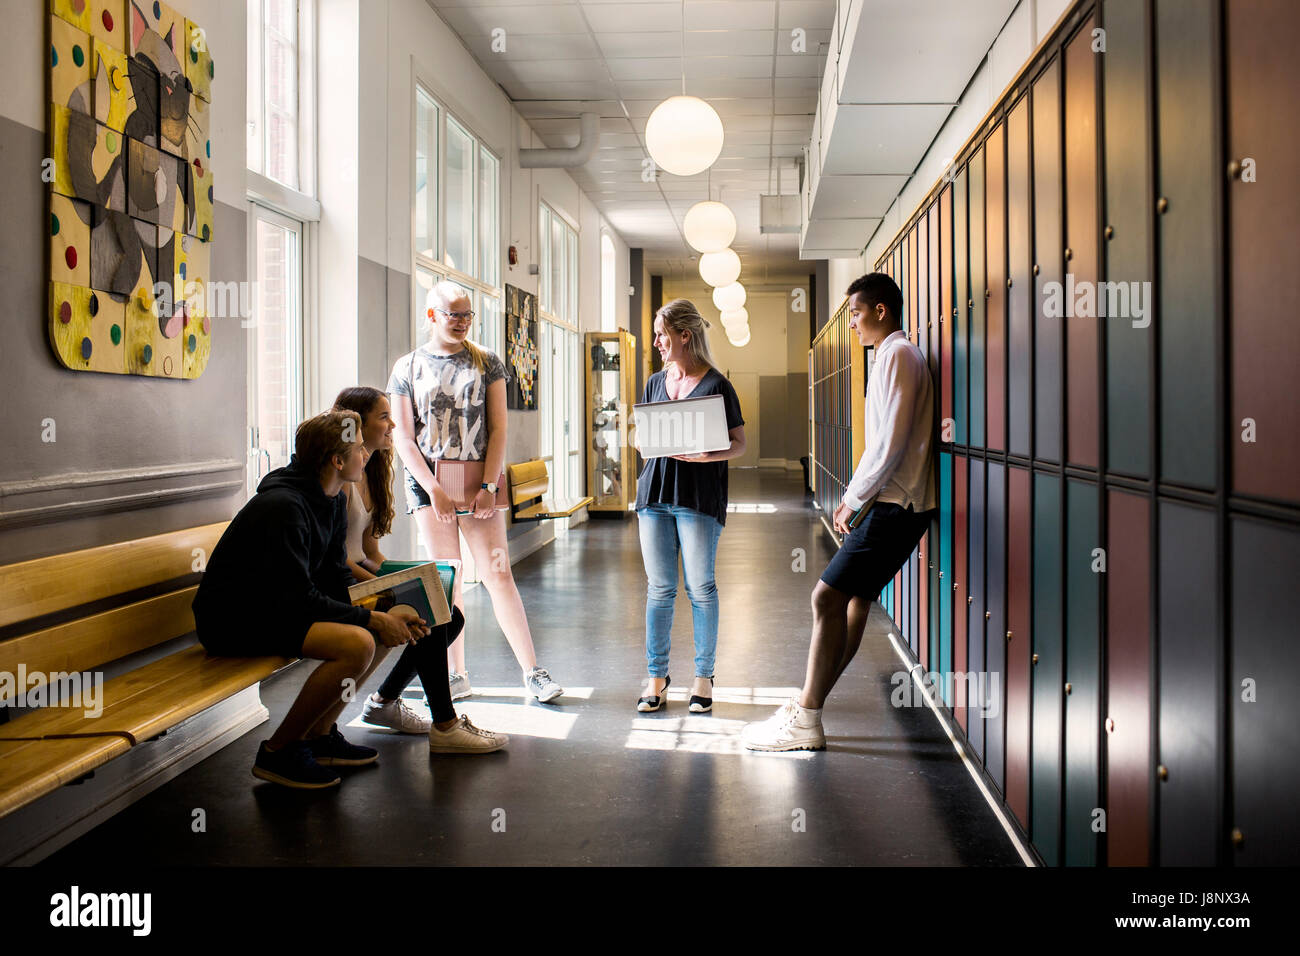 Students (14-15) in corridor Stock Photo